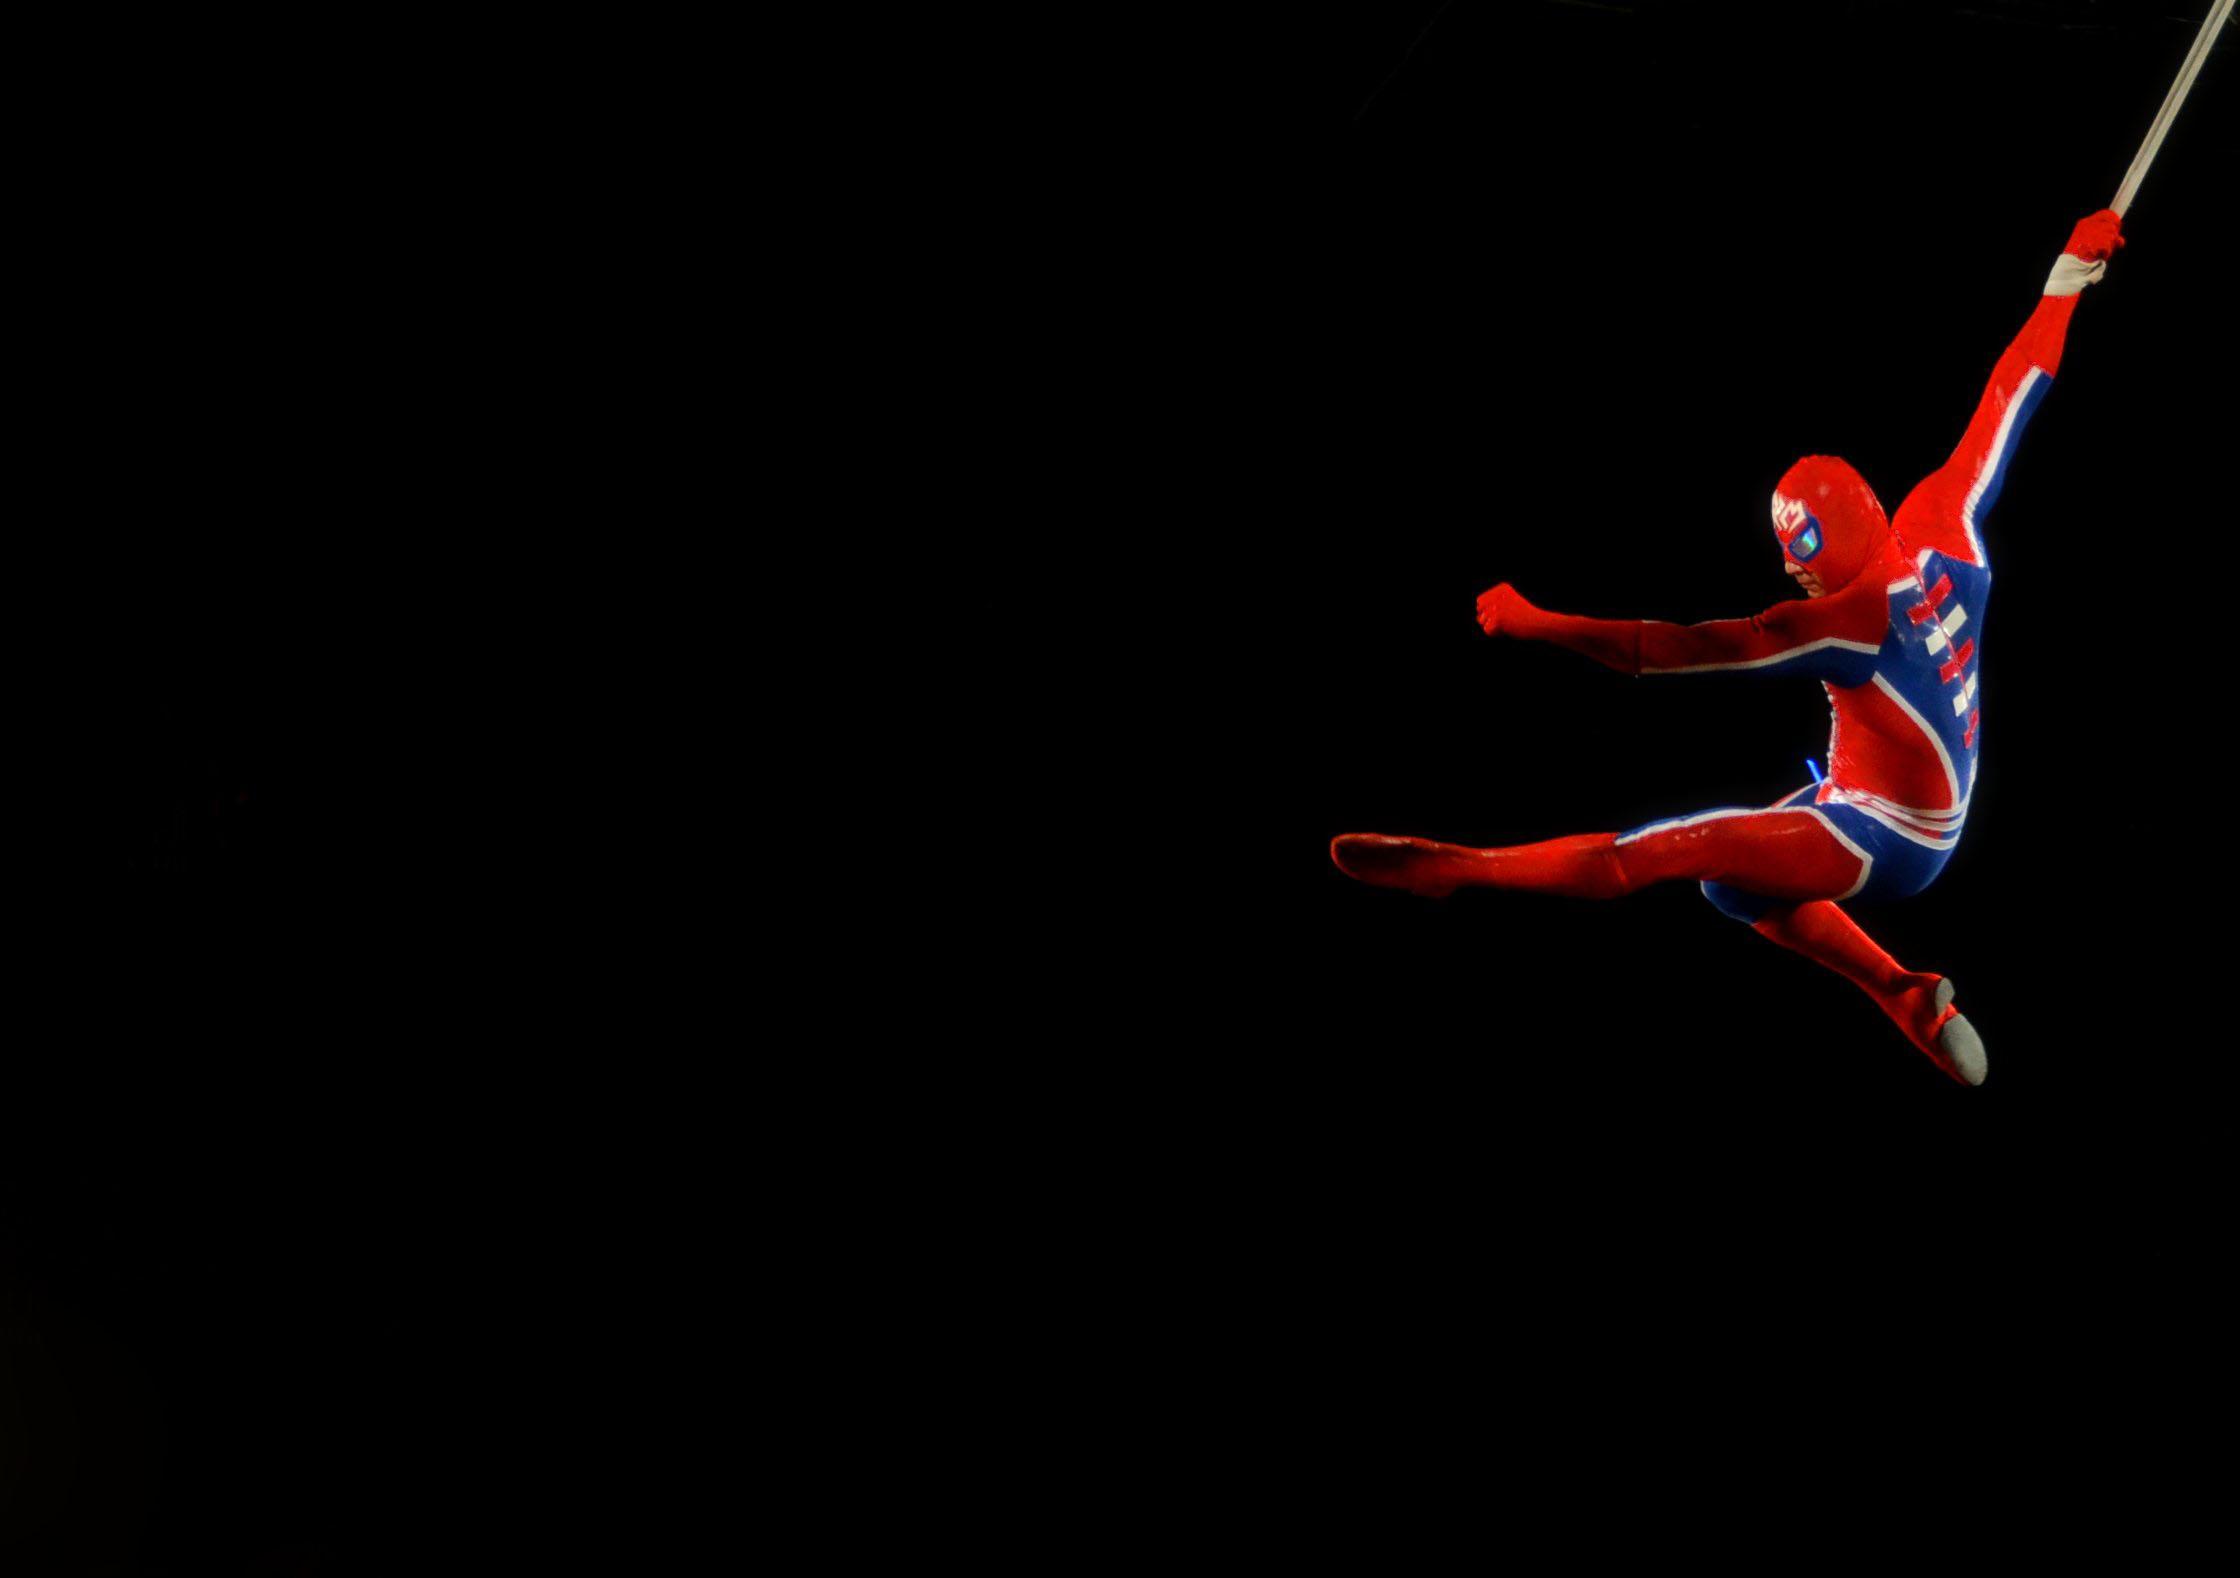 ... extreme sport, performing arts, performer, superheroes, acrobat, performers, trapeze, acrobats, springfieldmissouri, crimefighter, springfieldmo, ...